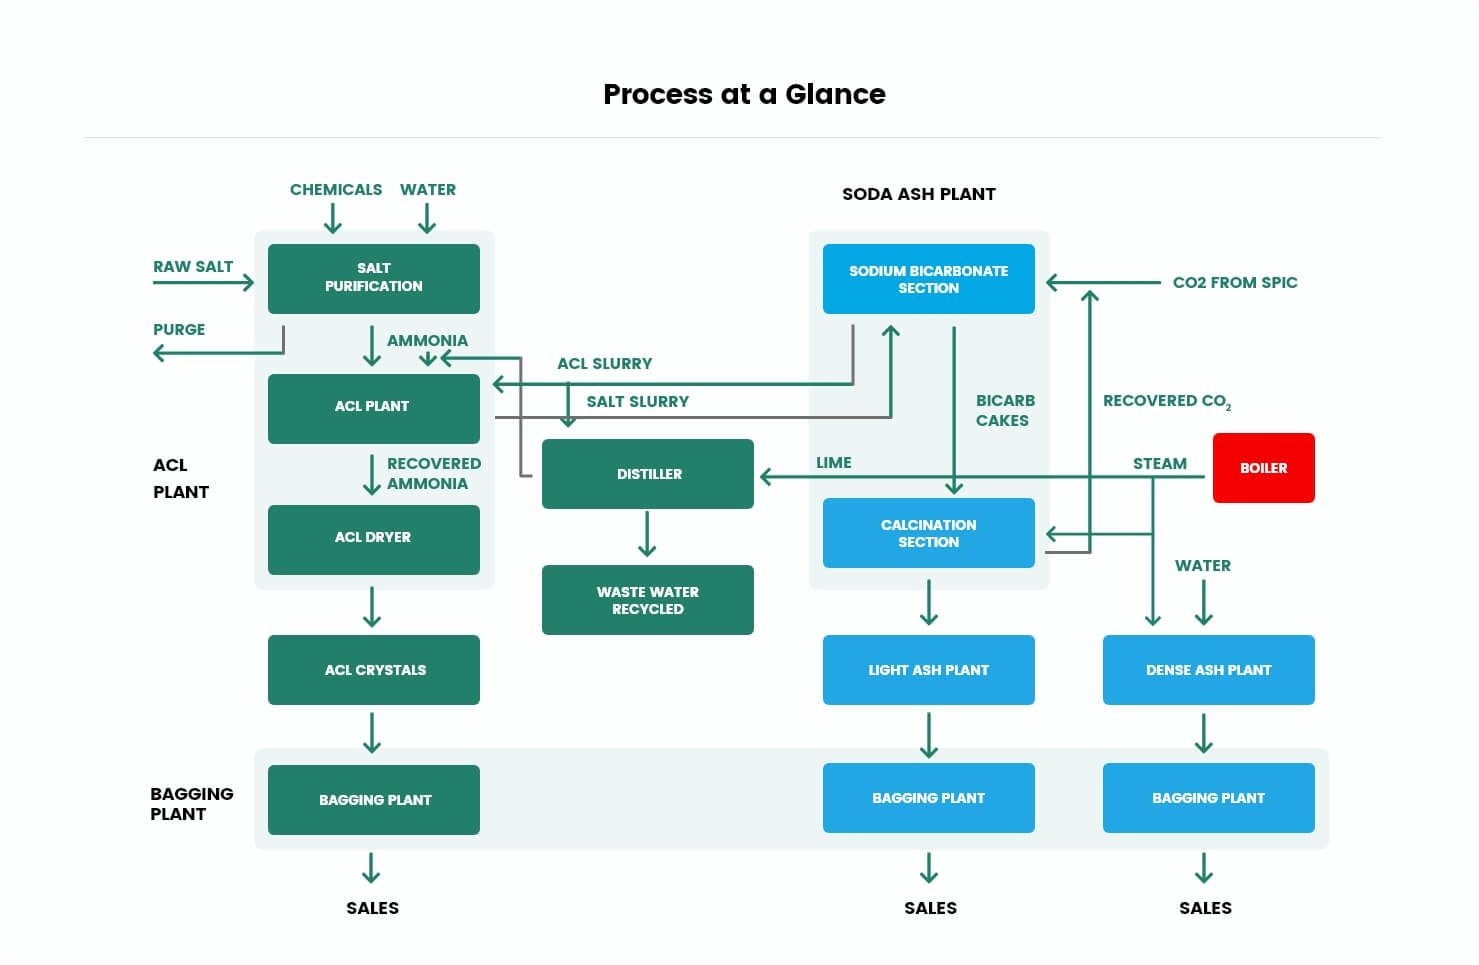 Process at a Glance